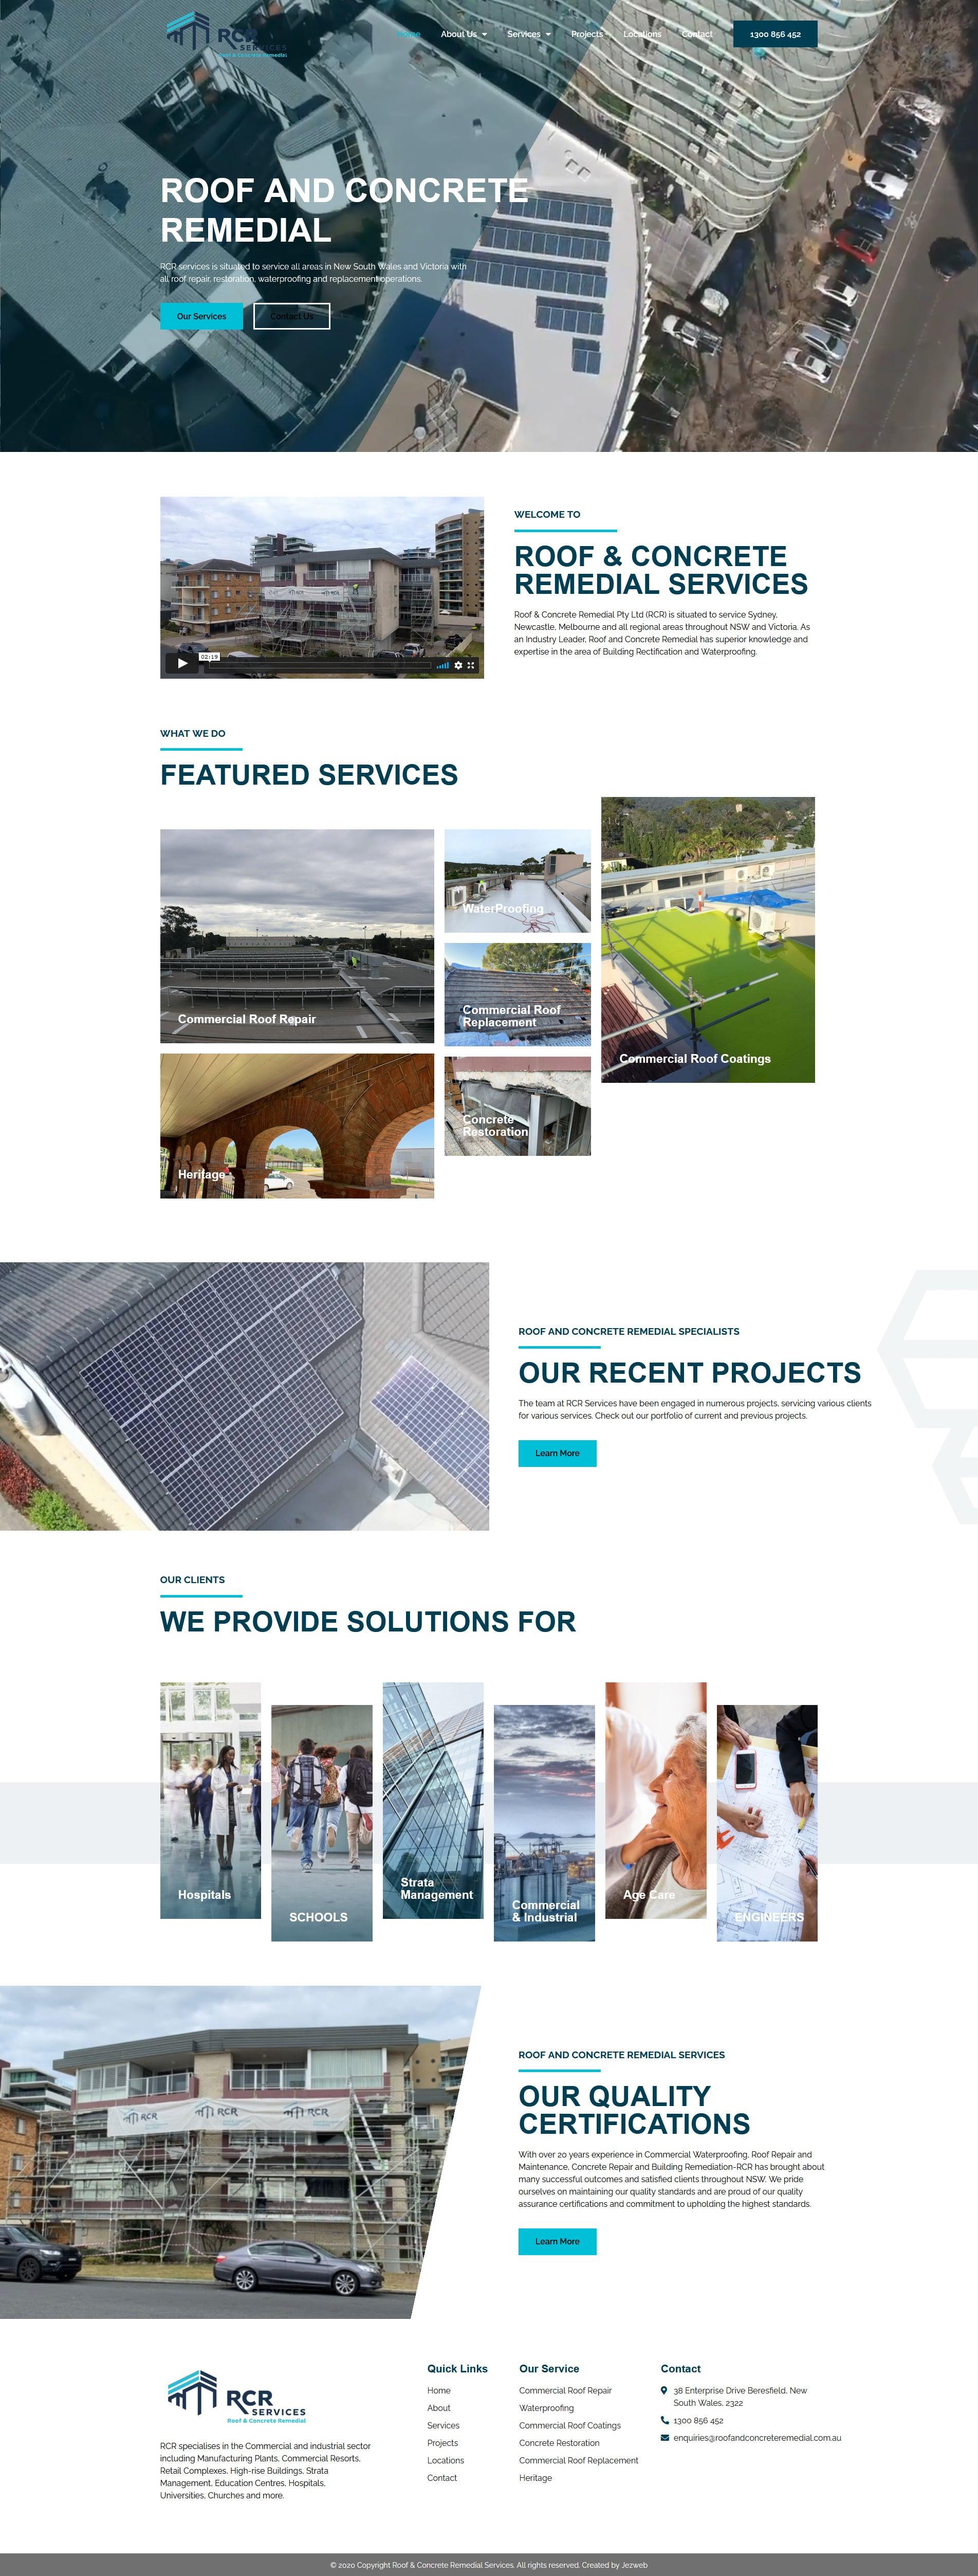 RCR Services -